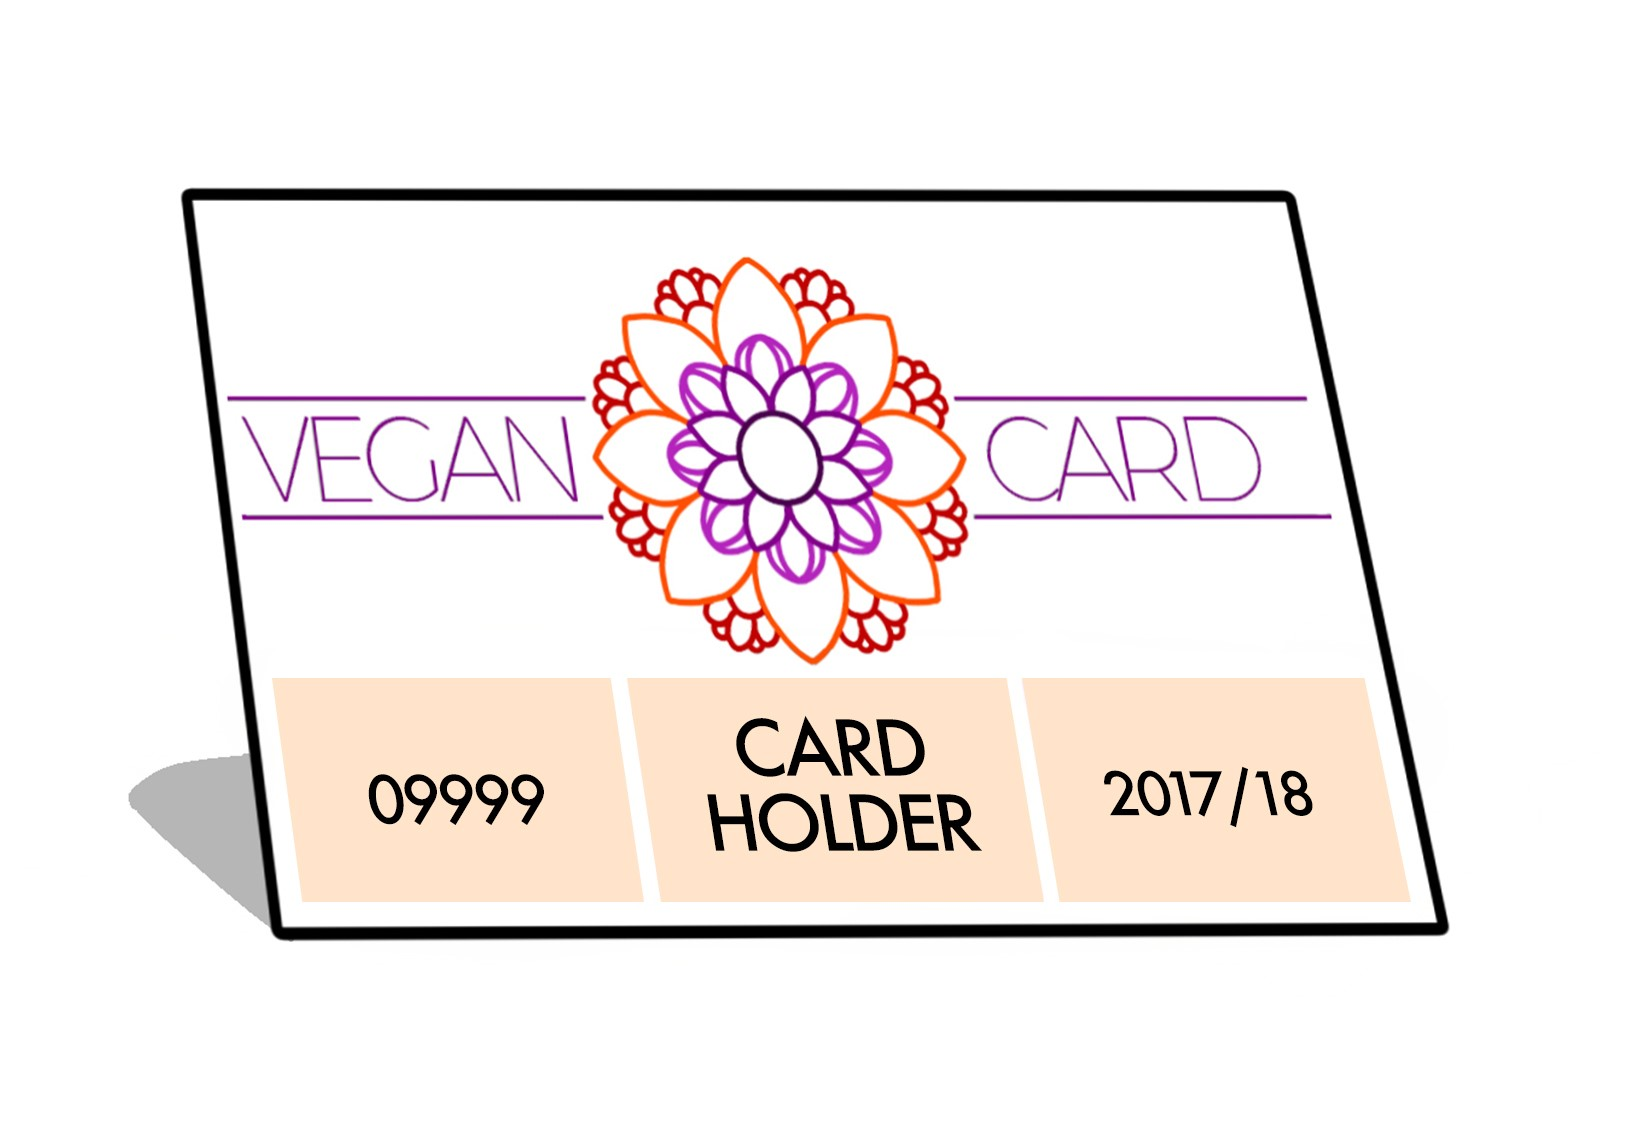 Vegan Card valid to June 30 2018